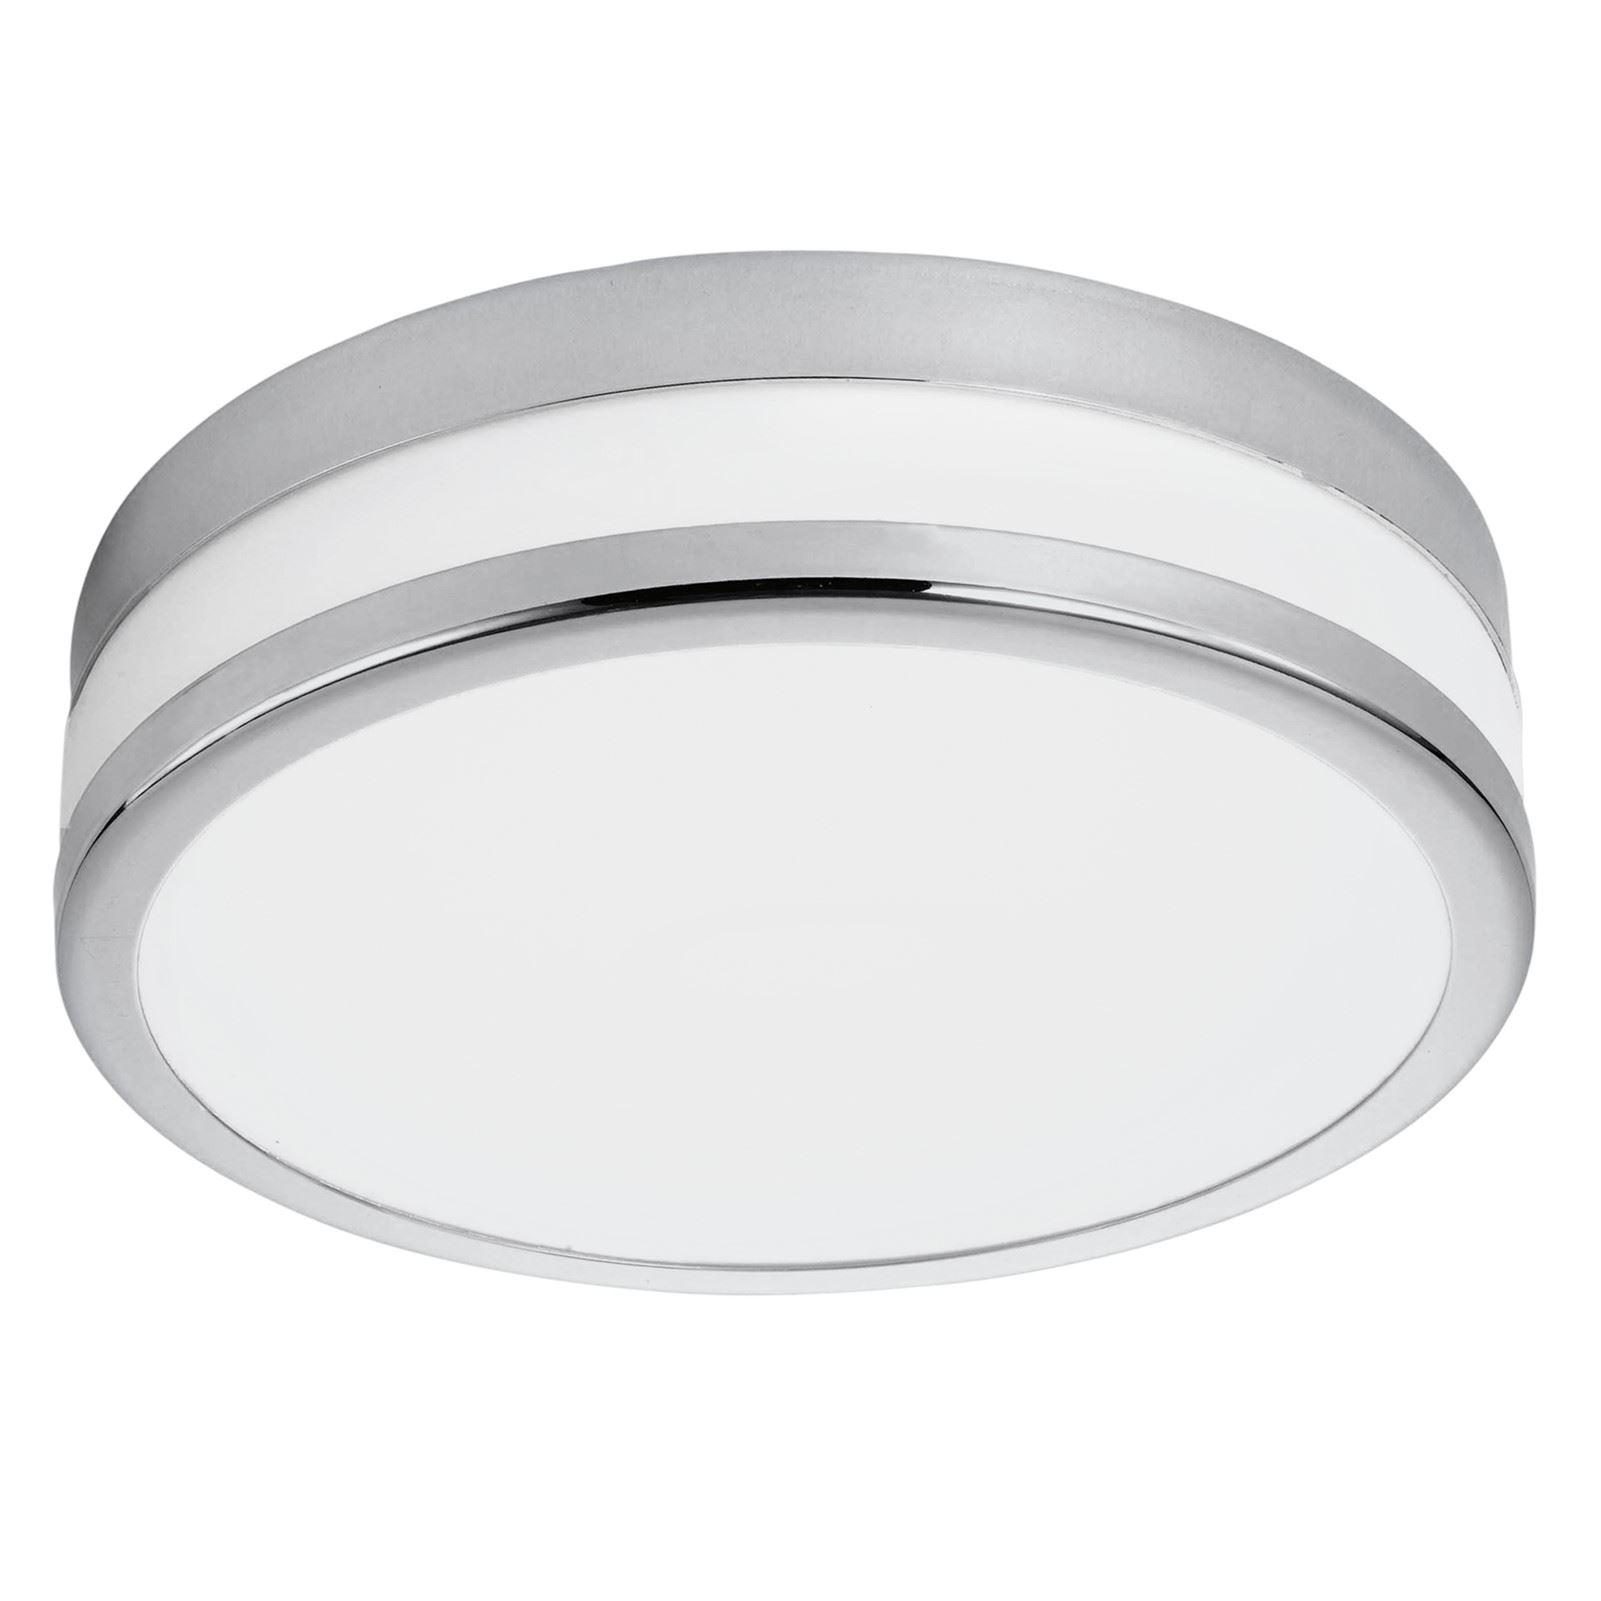 Palermo LED Ceiling Light Steel Chrome Coated White Shade Dia 295 mm